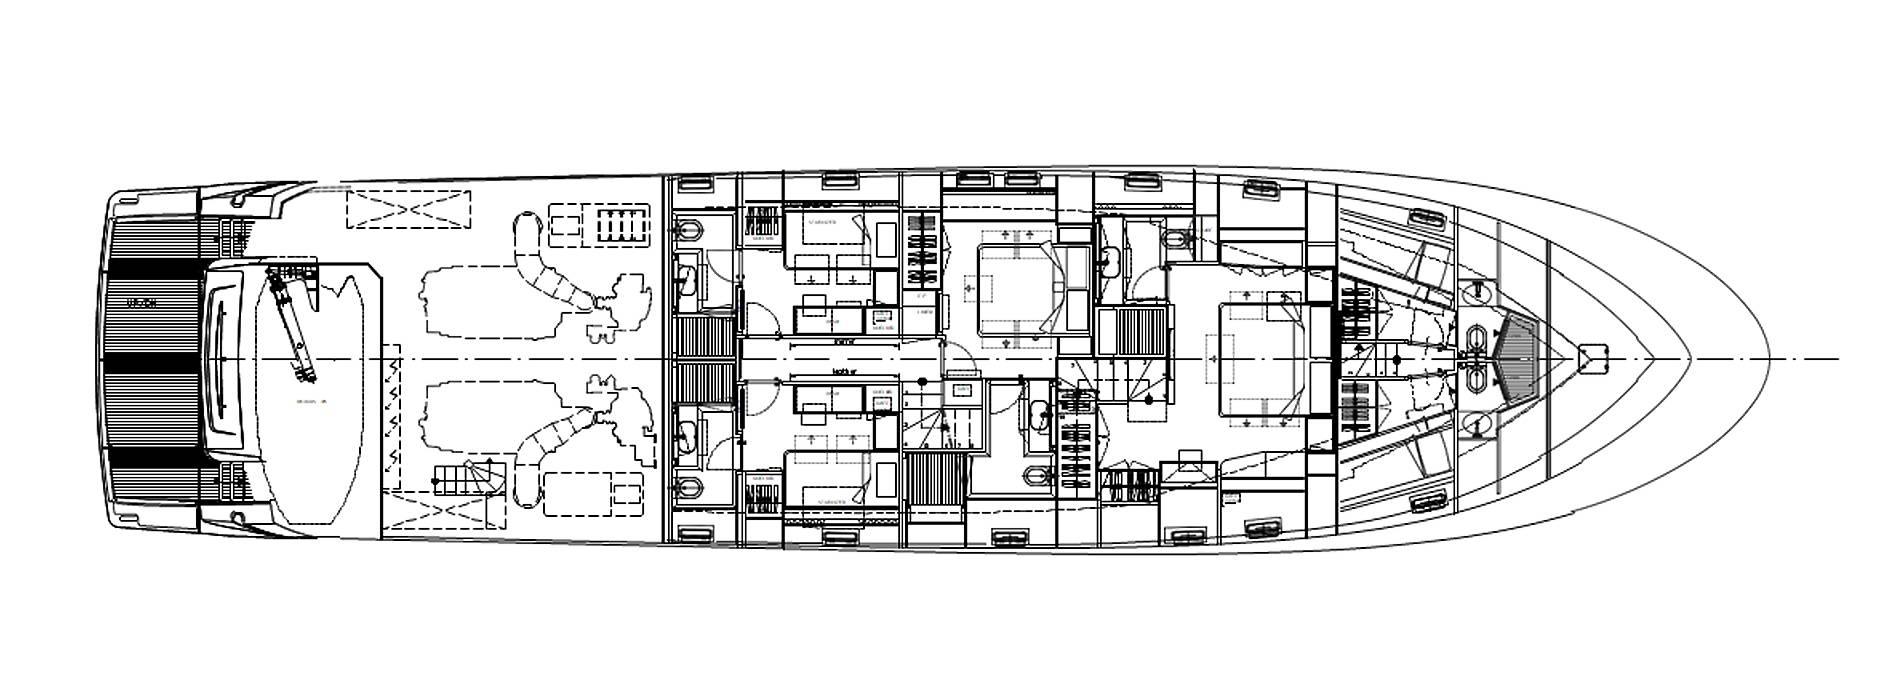 Sanlorenzo Yachts SL96-623 下层甲板